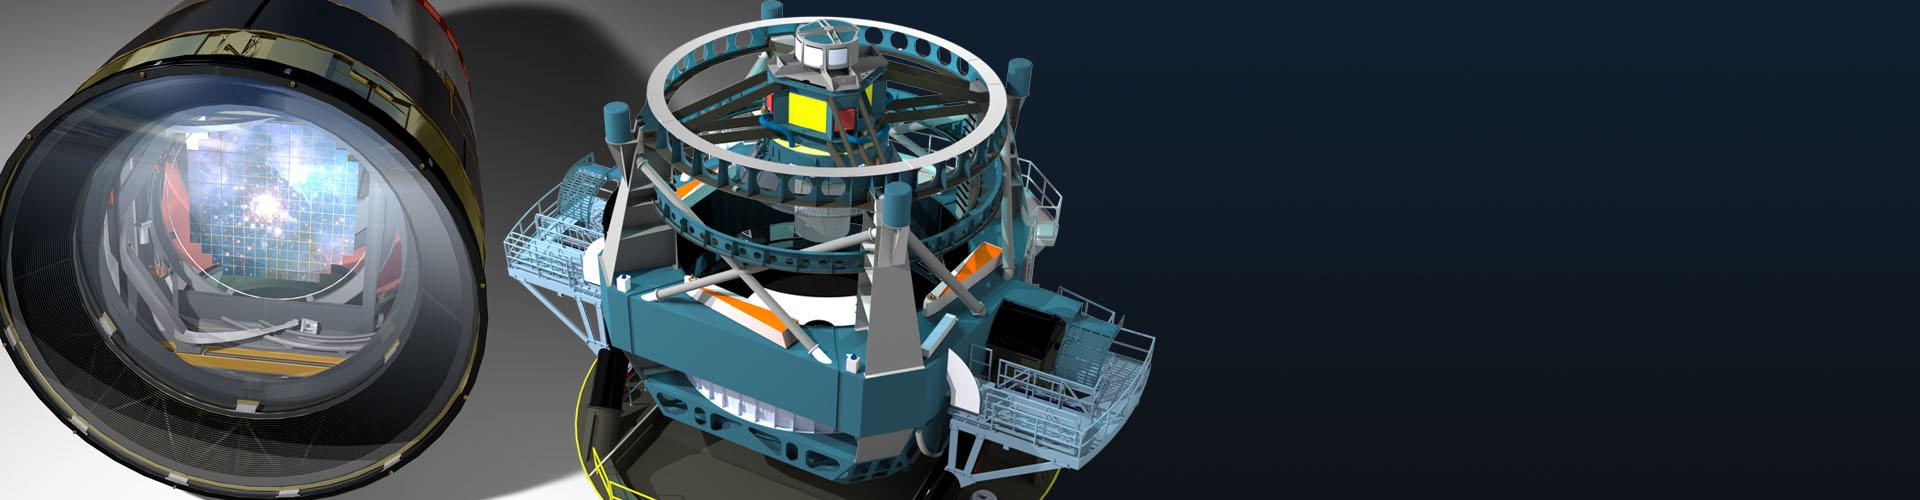 Welcome | The Large Synoptic Survey Telescope